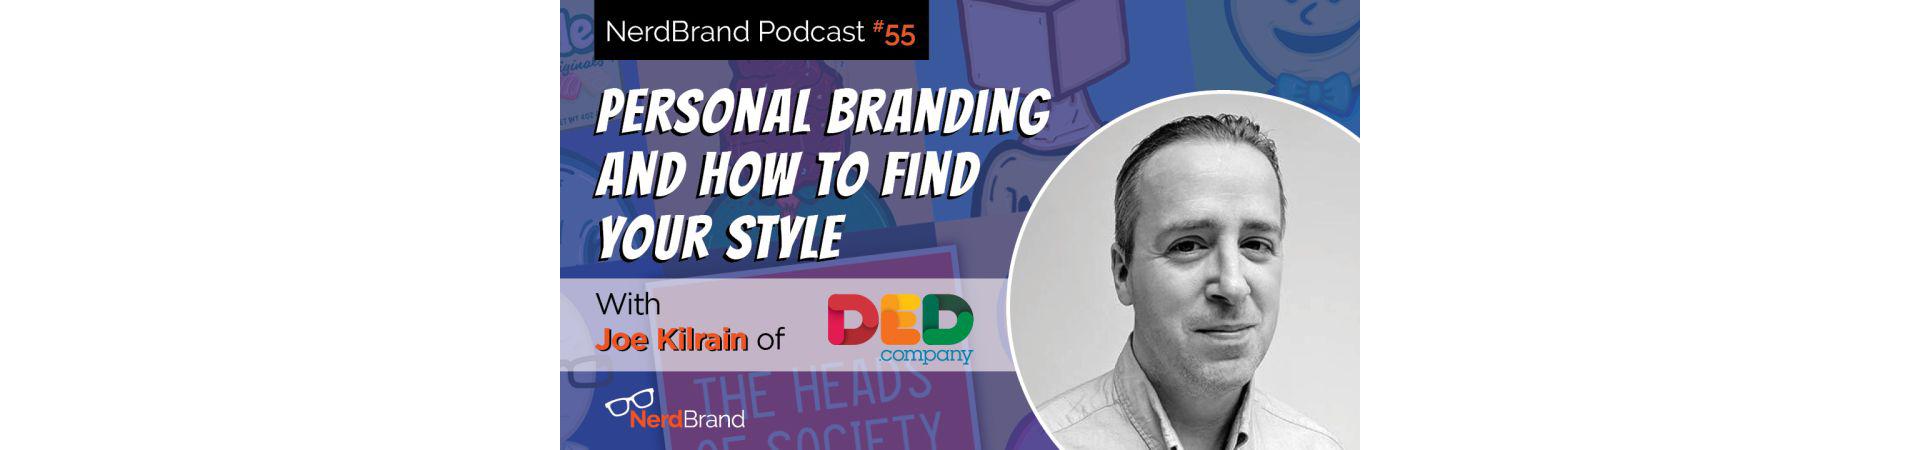 Establishing your personal branding with NerdBrand